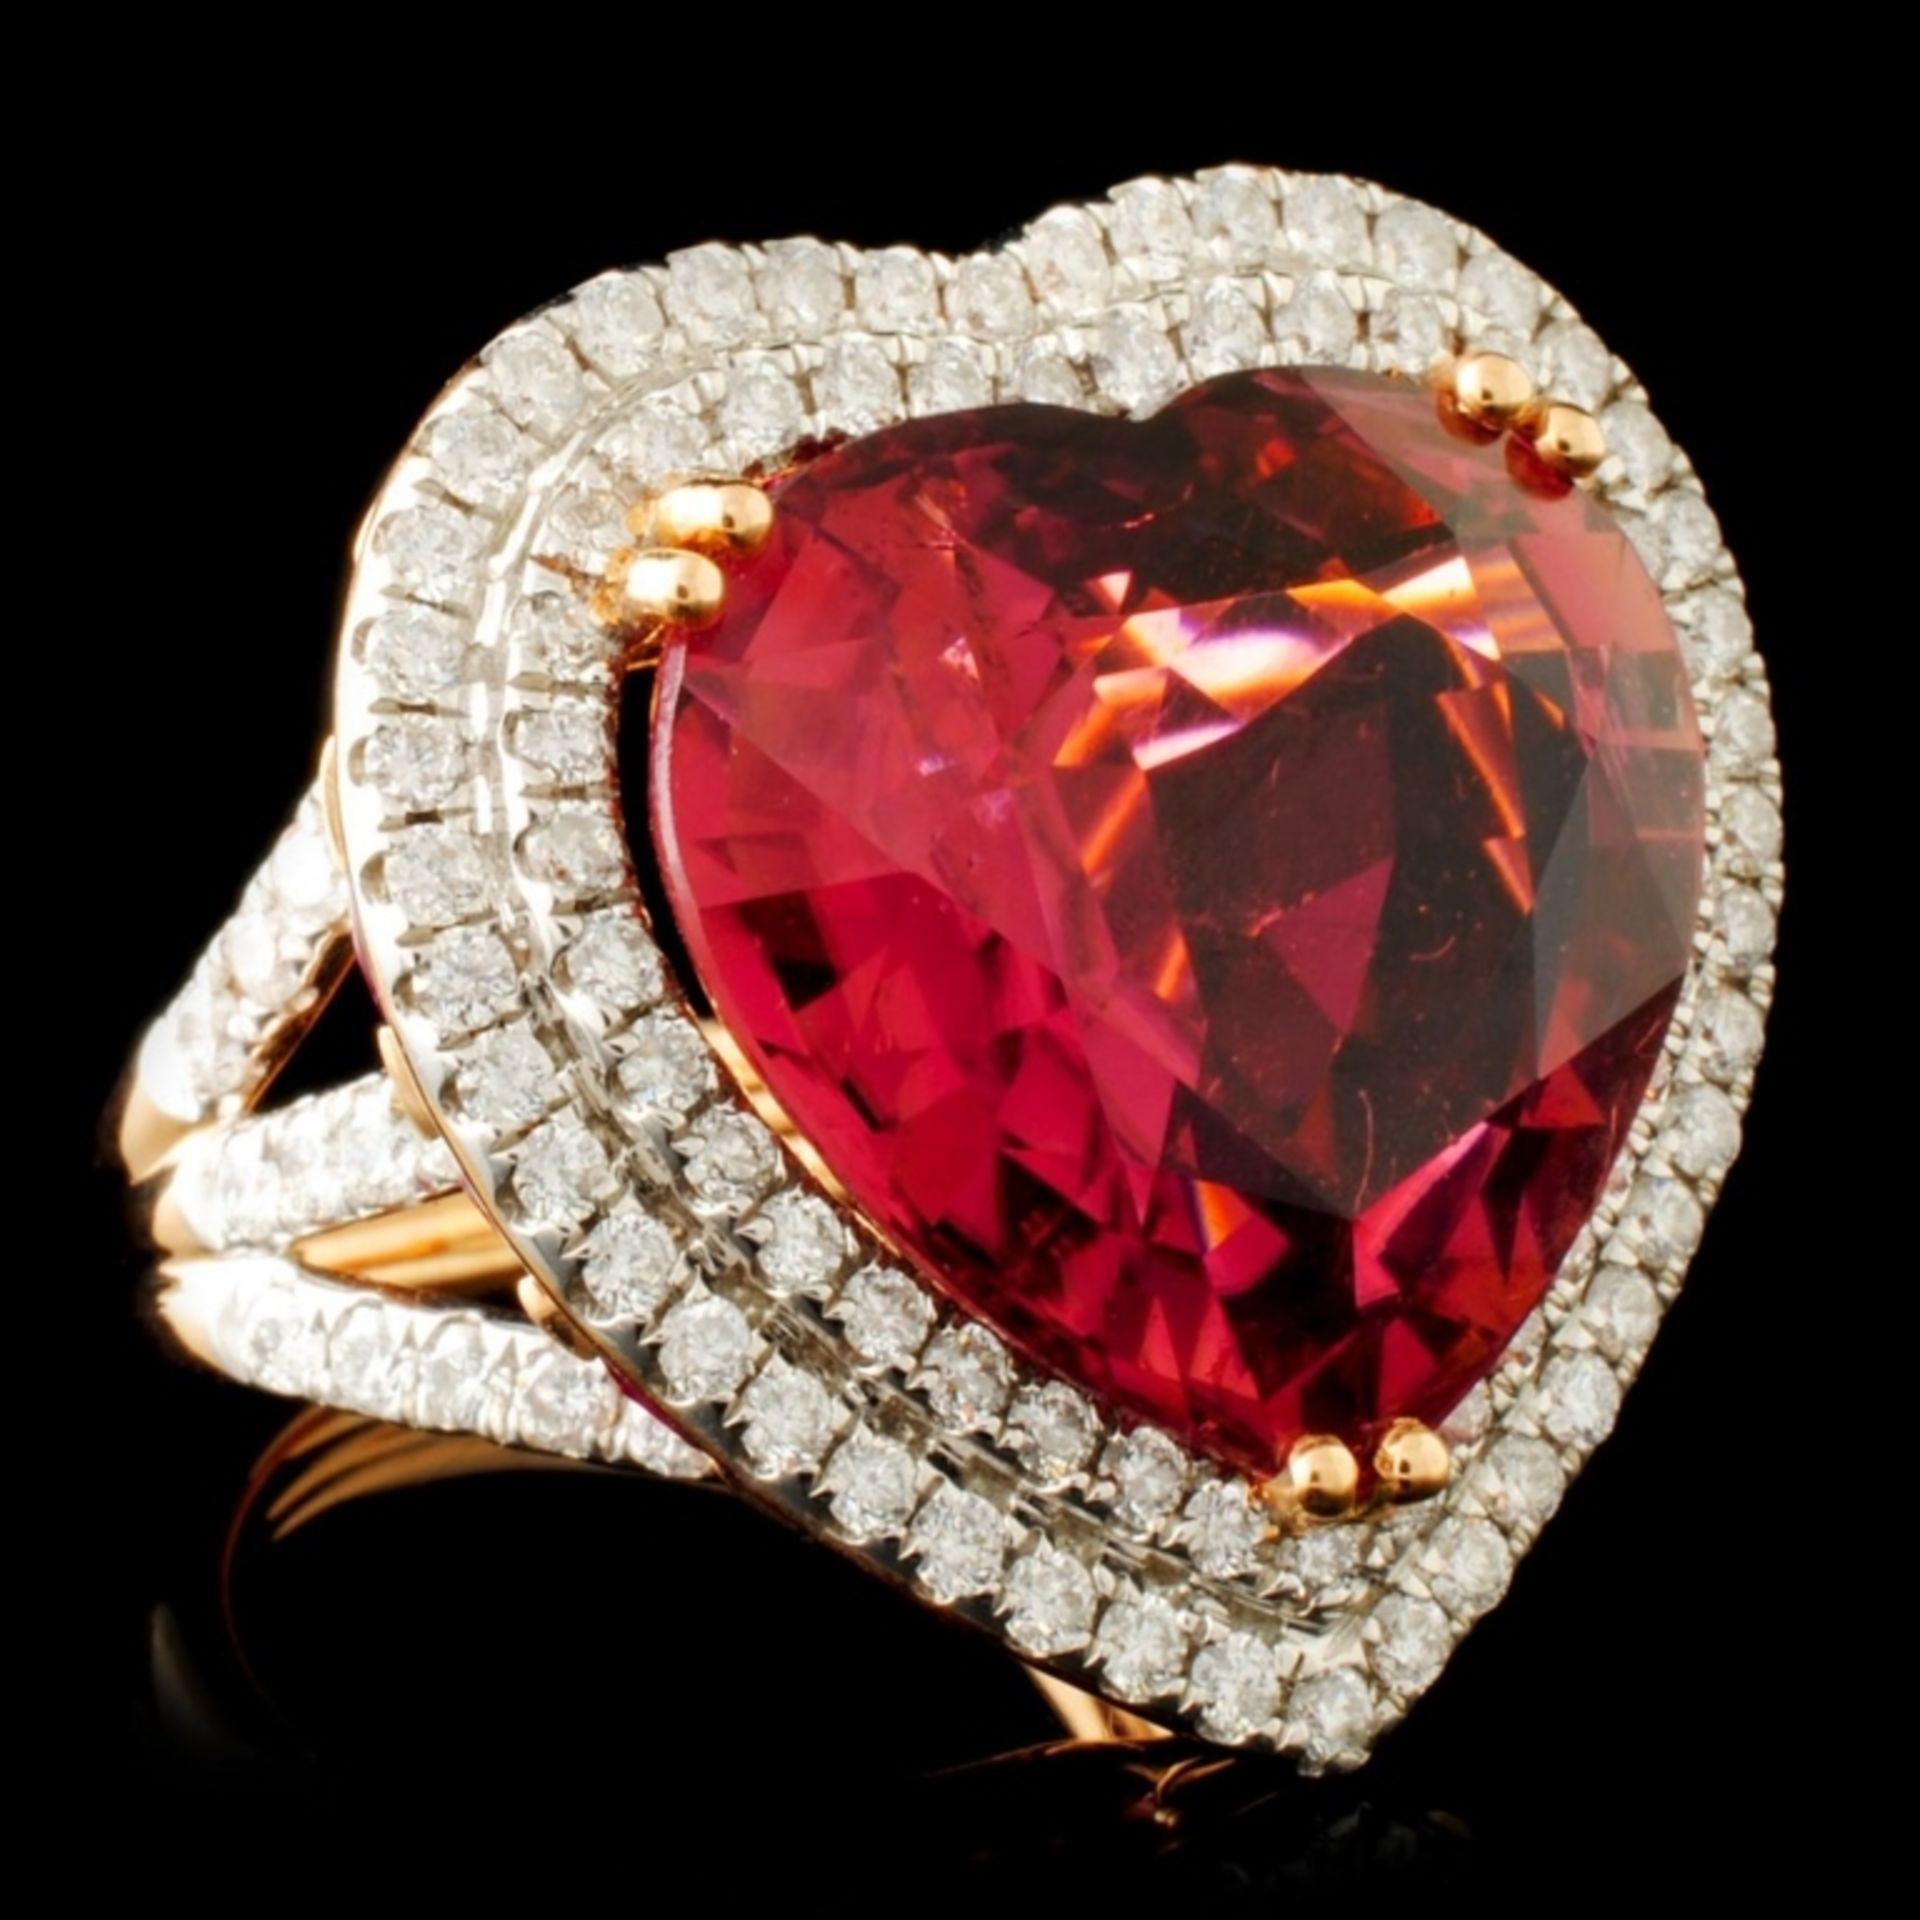 18K Gold 16.47ct Rubellite & 1.76ctw Diamond Ring - Image 3 of 6